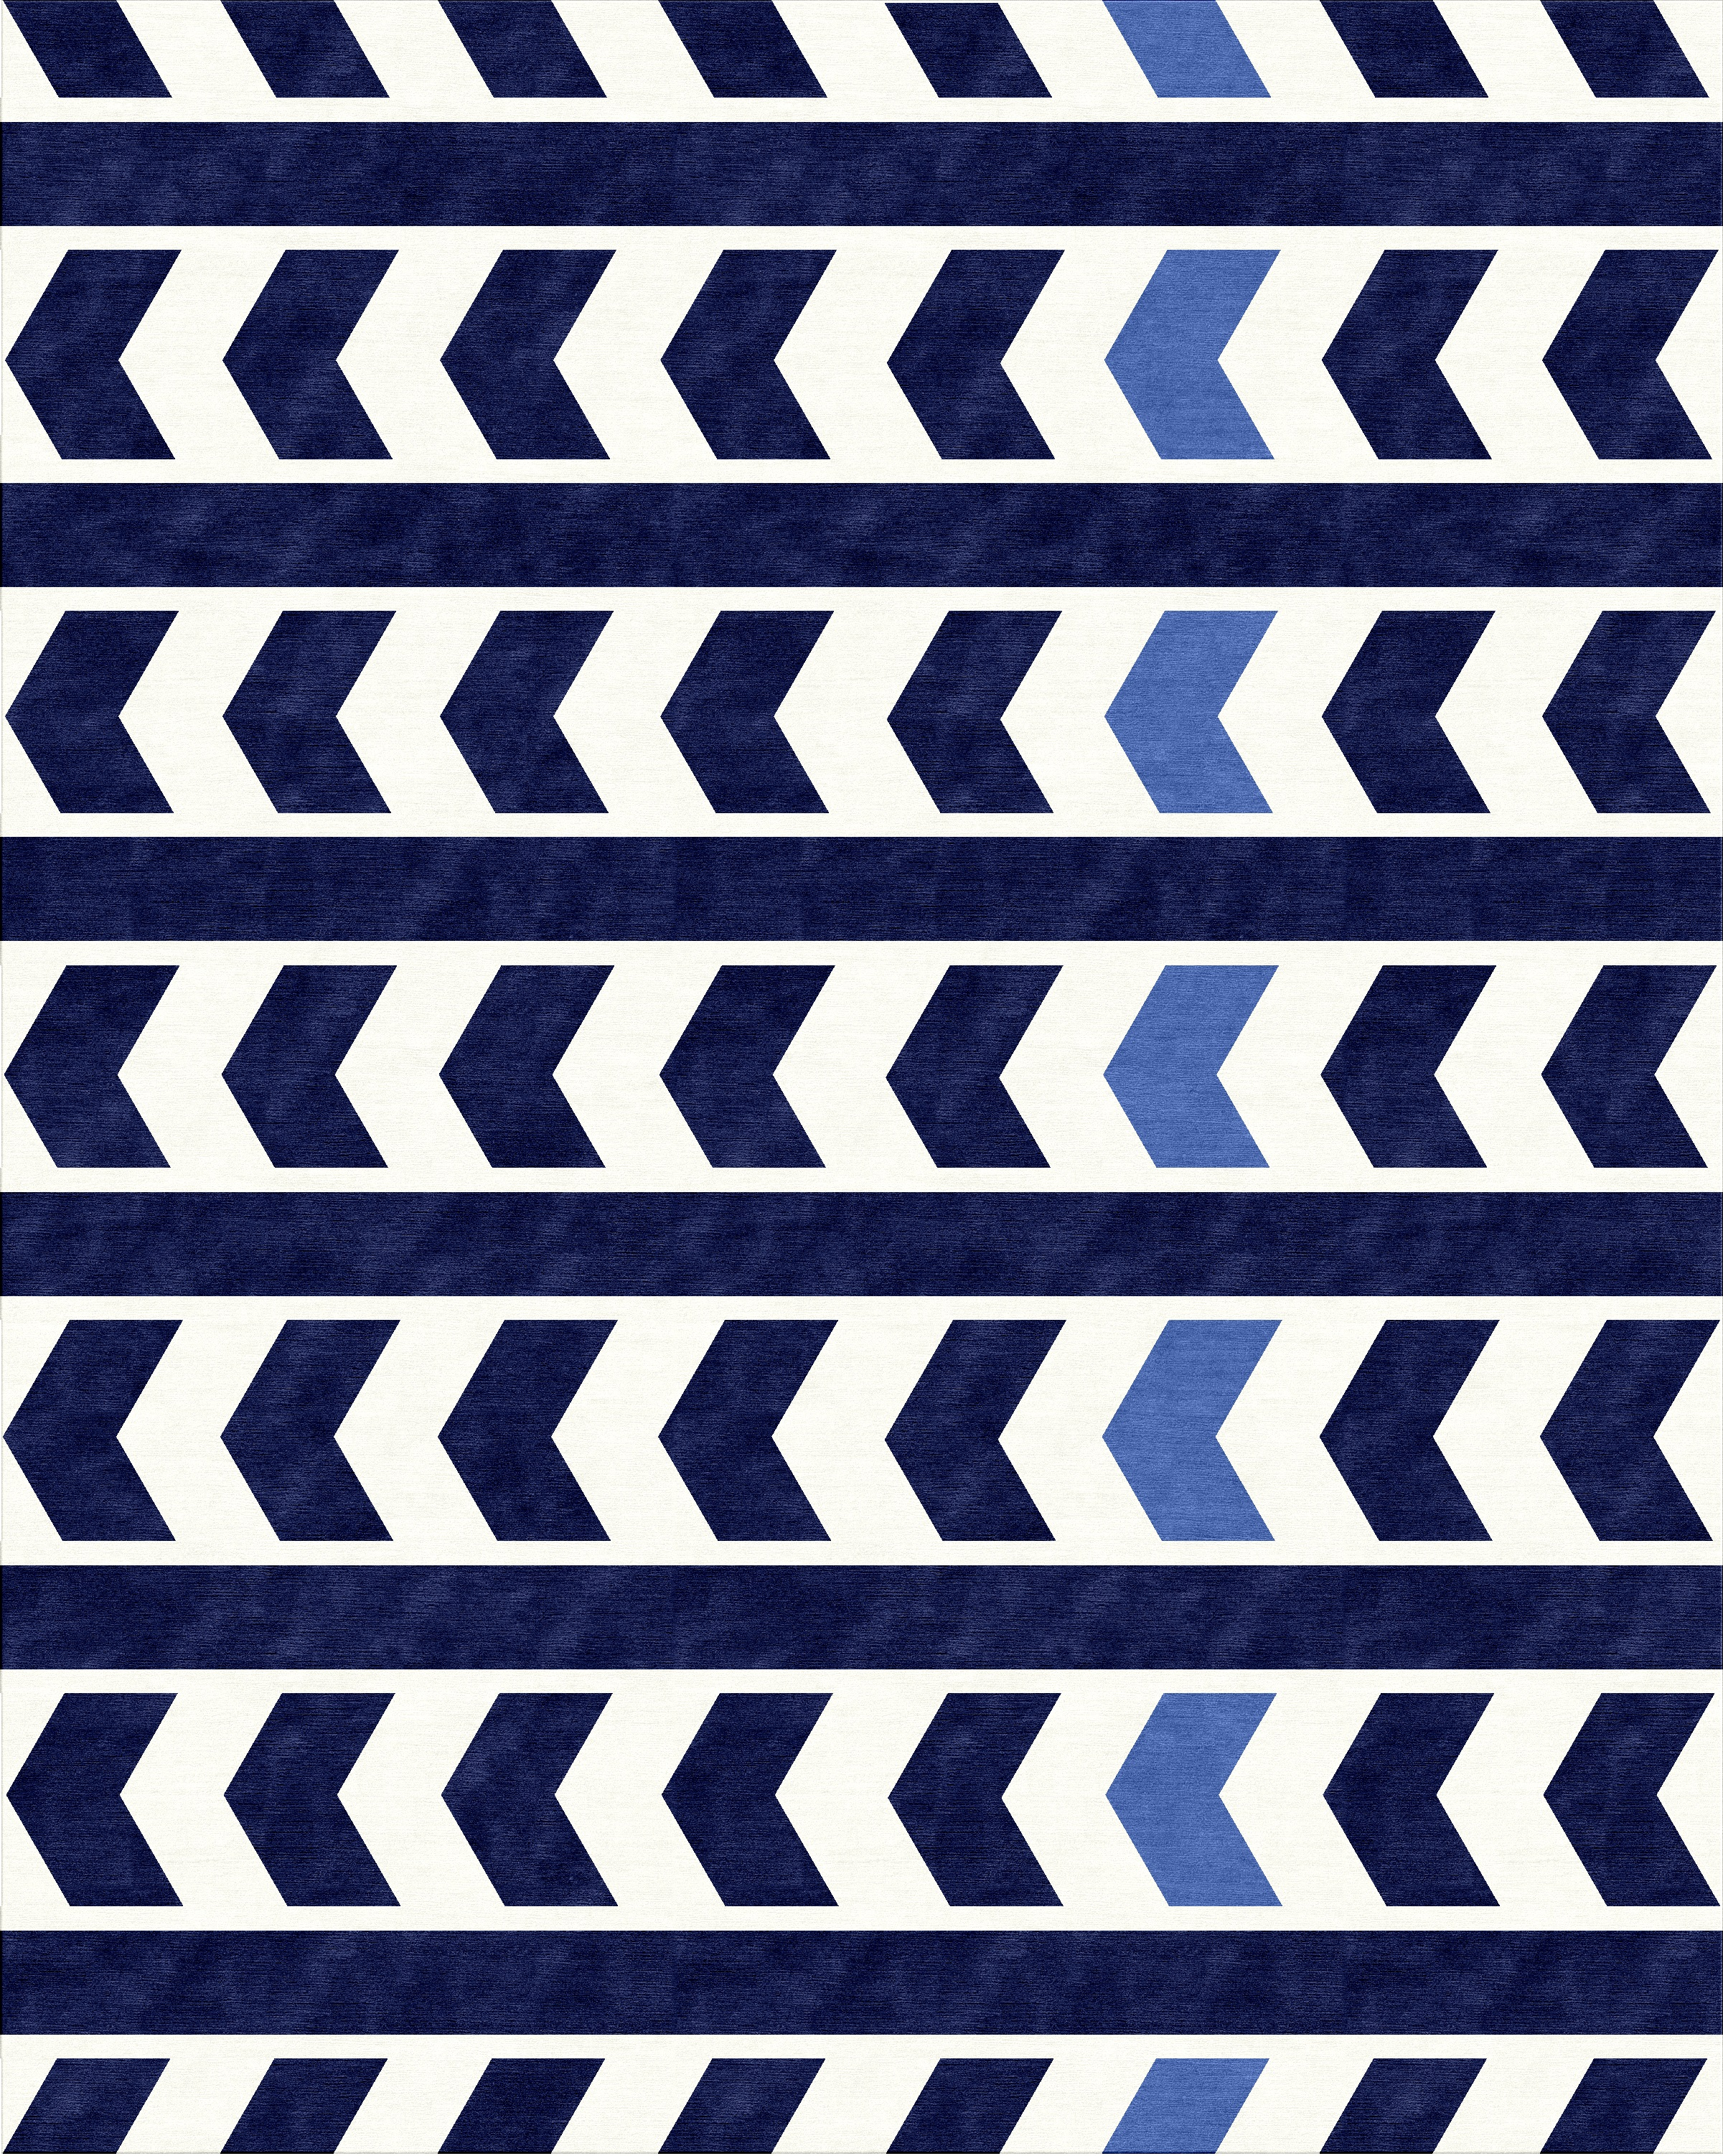 Zag Stripe (Rolex)